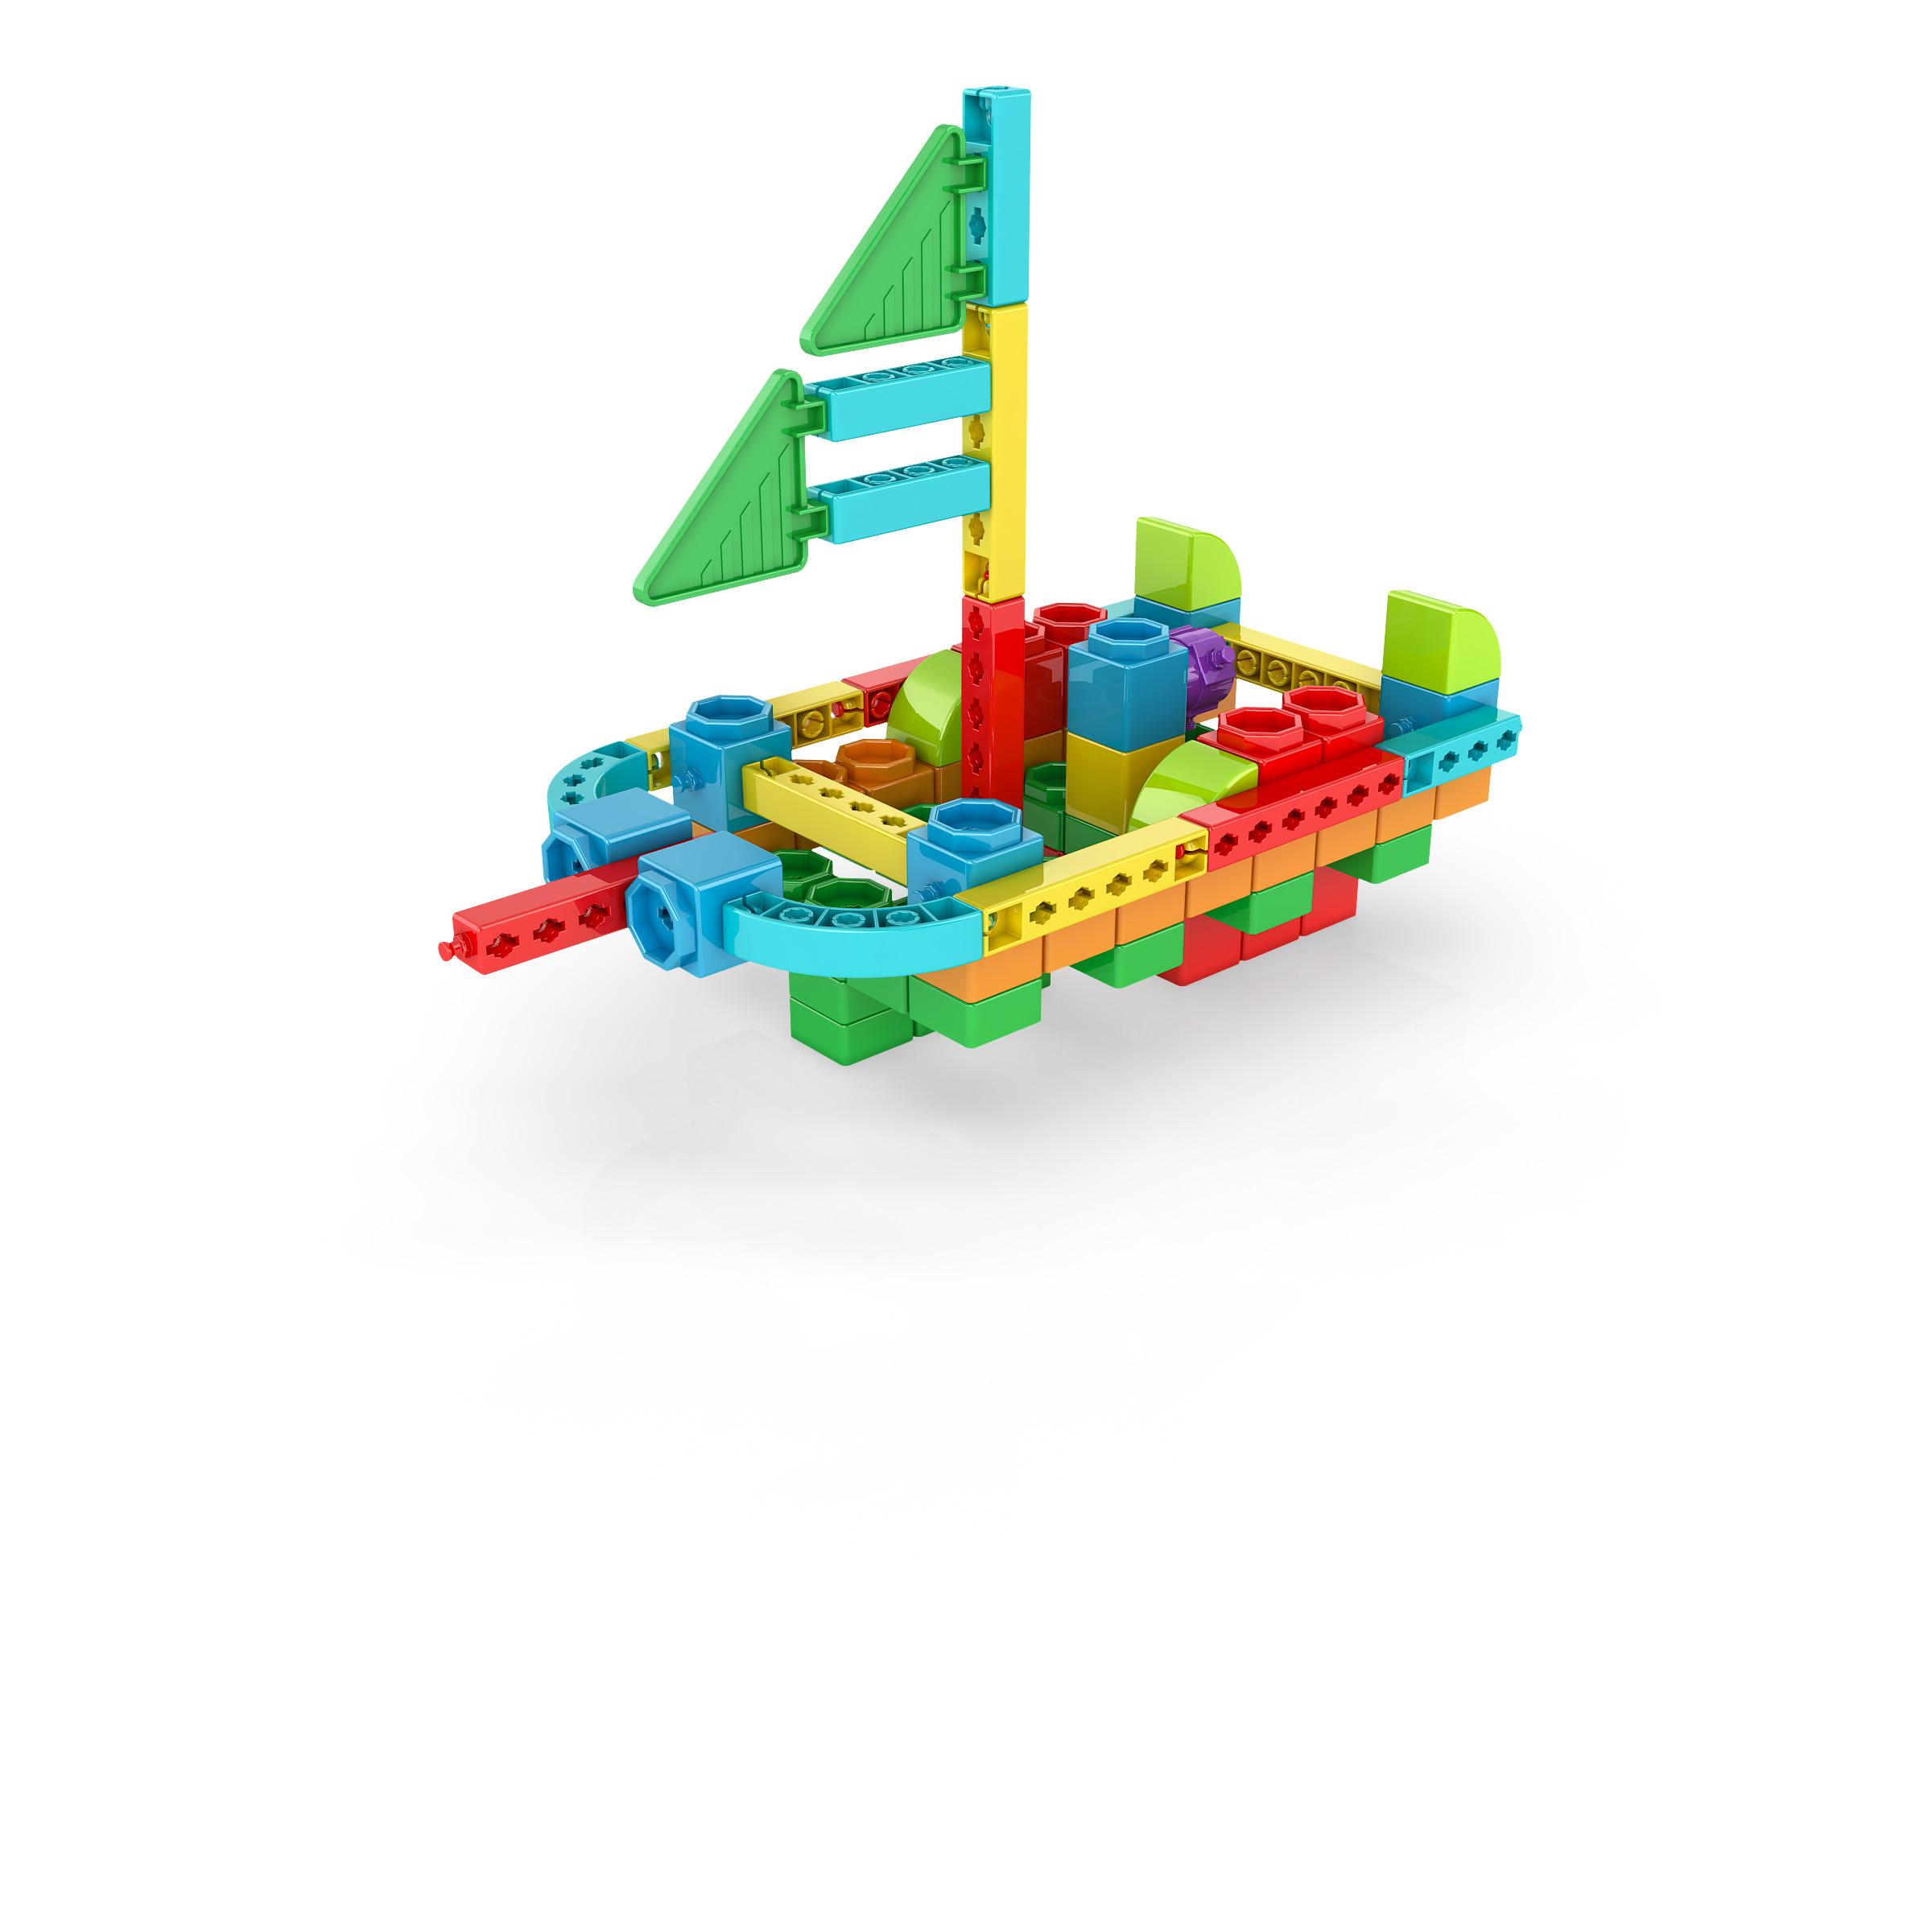 , PiratesShip 2, משחקי חשיבה לילדים engino, משחקים לגיל הרך playgro, משחק הרכבות אנג'ינו, משחקי רכבות